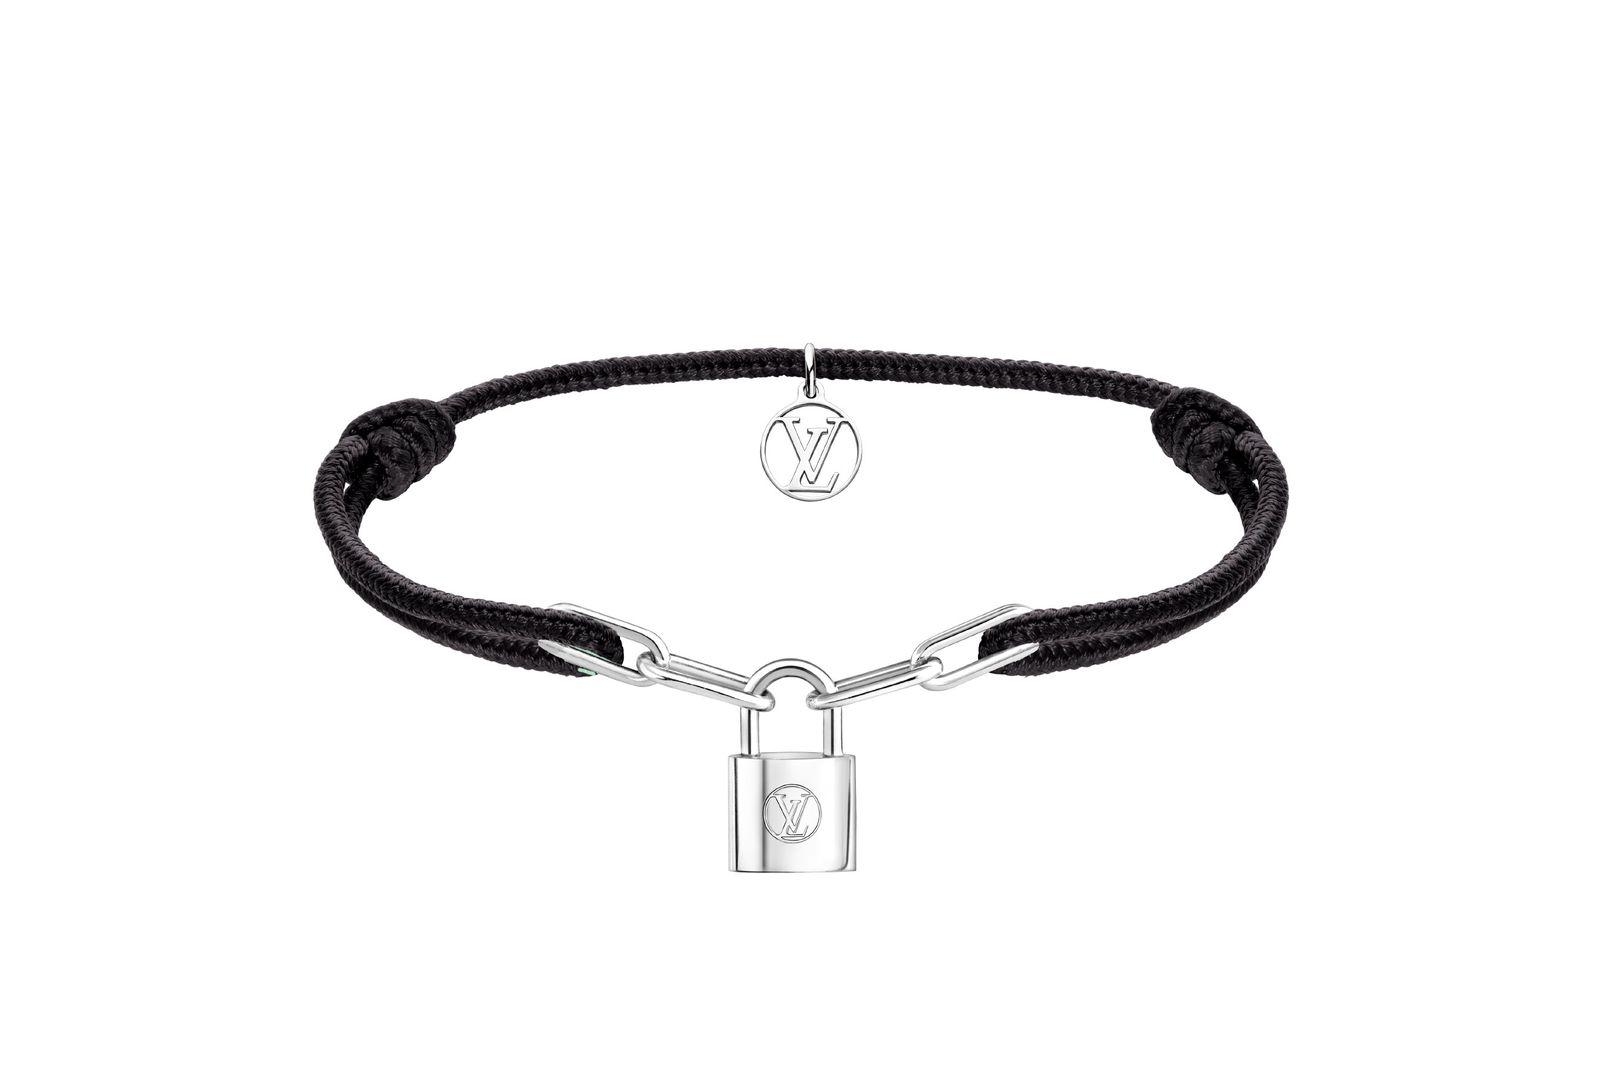 LV_EDITED_Q95864_Bracelet-Silver-Lockit-x-V.A._Noir